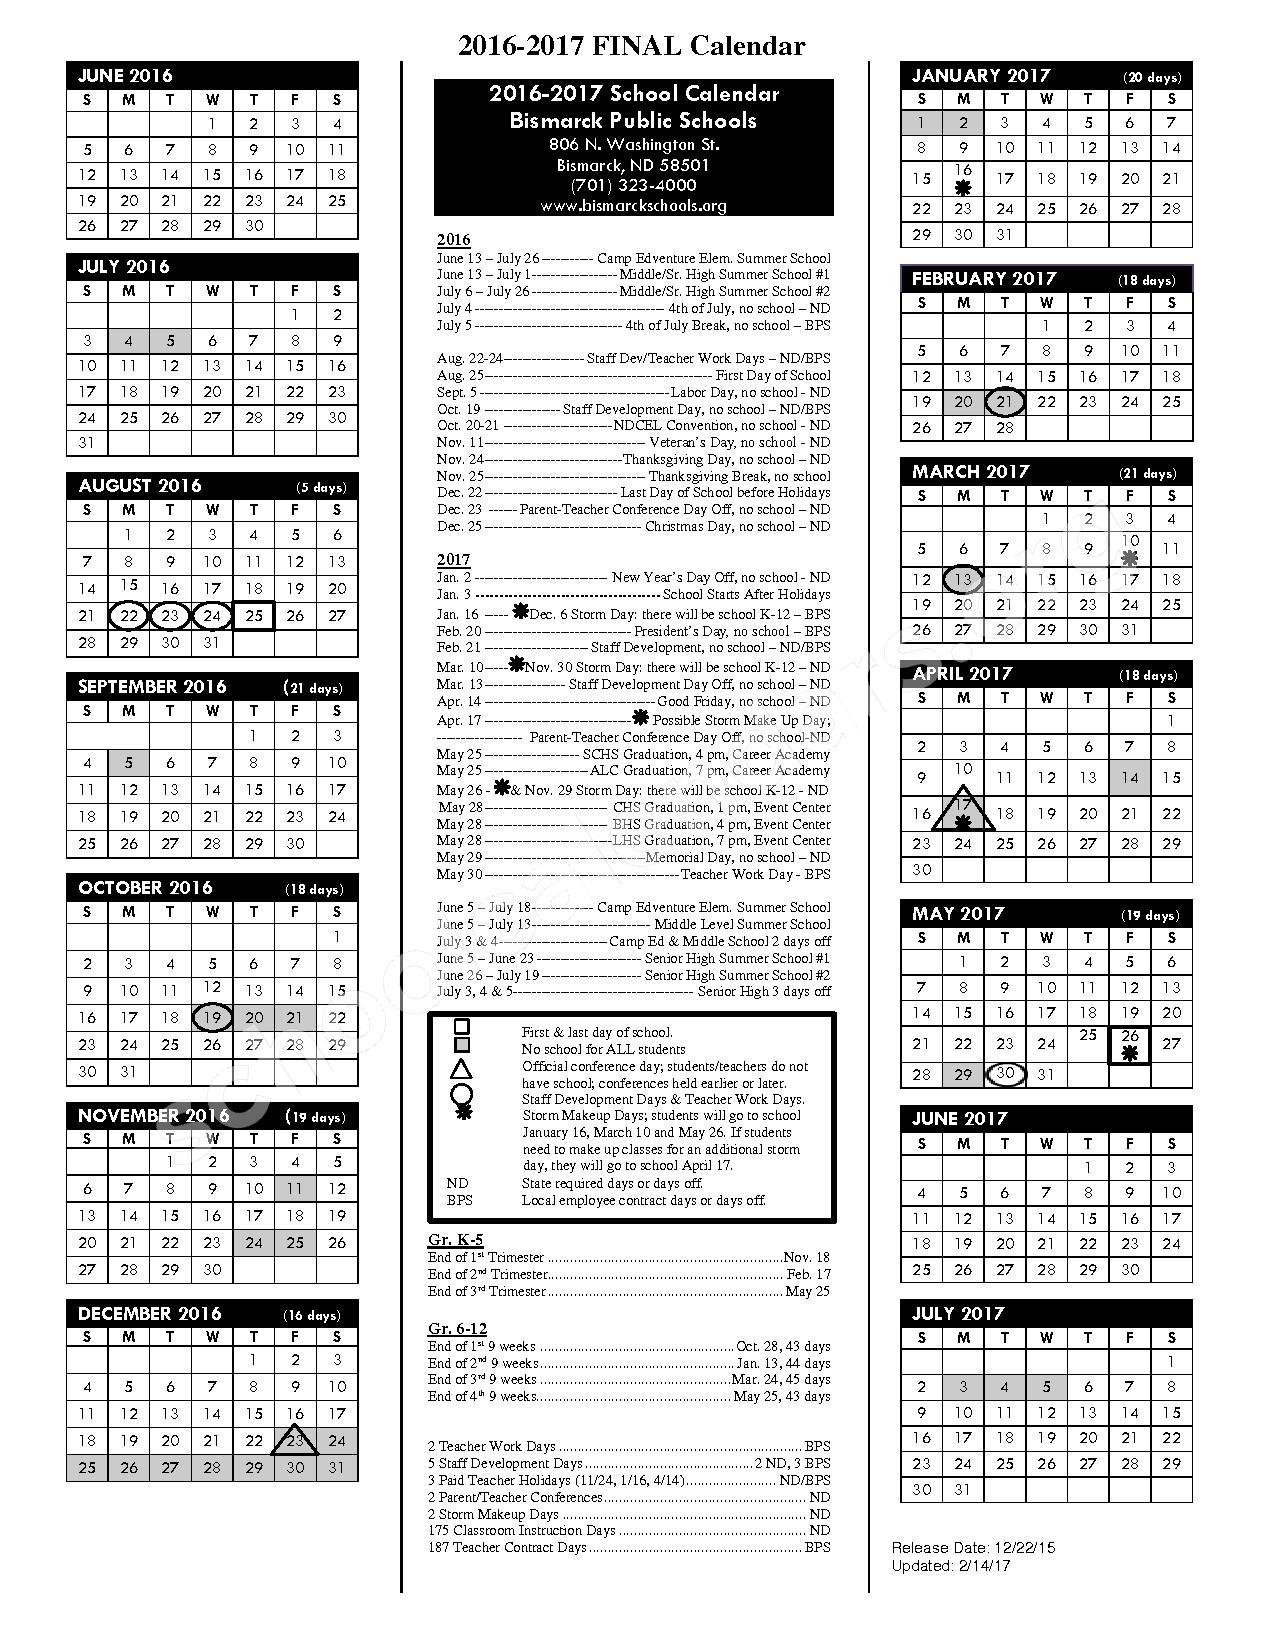 2016 - 2017 School Calendar – South Central Alternative School – page 1